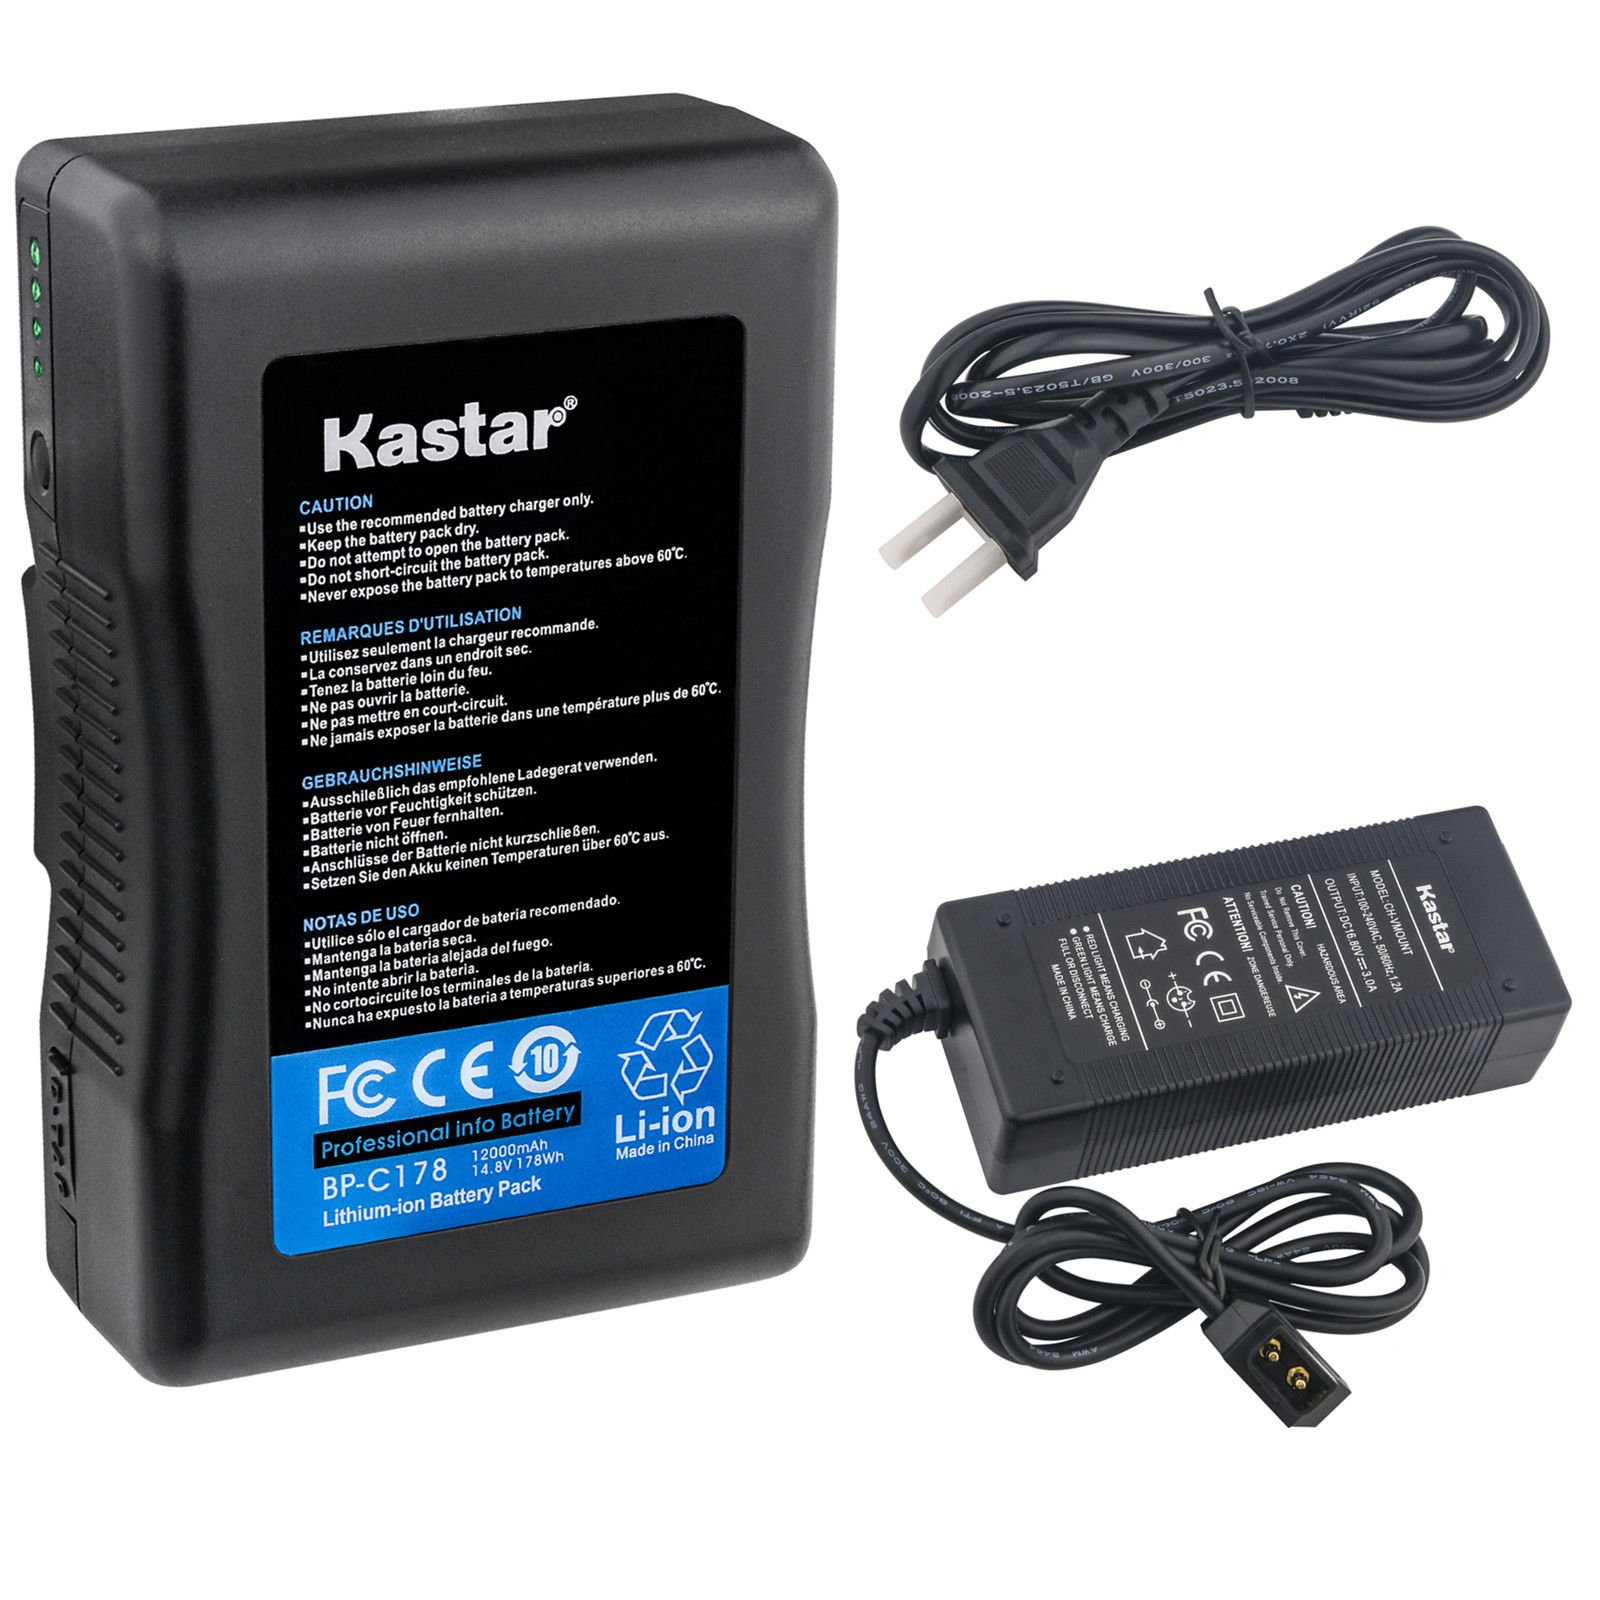 Kastar Charger and BP-C178 Broadcast Battery Brick 14.8V 12000mAh 178Wh for Anton Bauer Digital 90 Gold Mount, ARRI Alexa Minicamera, AJA CION Camera Body, Blackmagic Design URSA, Cine Alta Camera